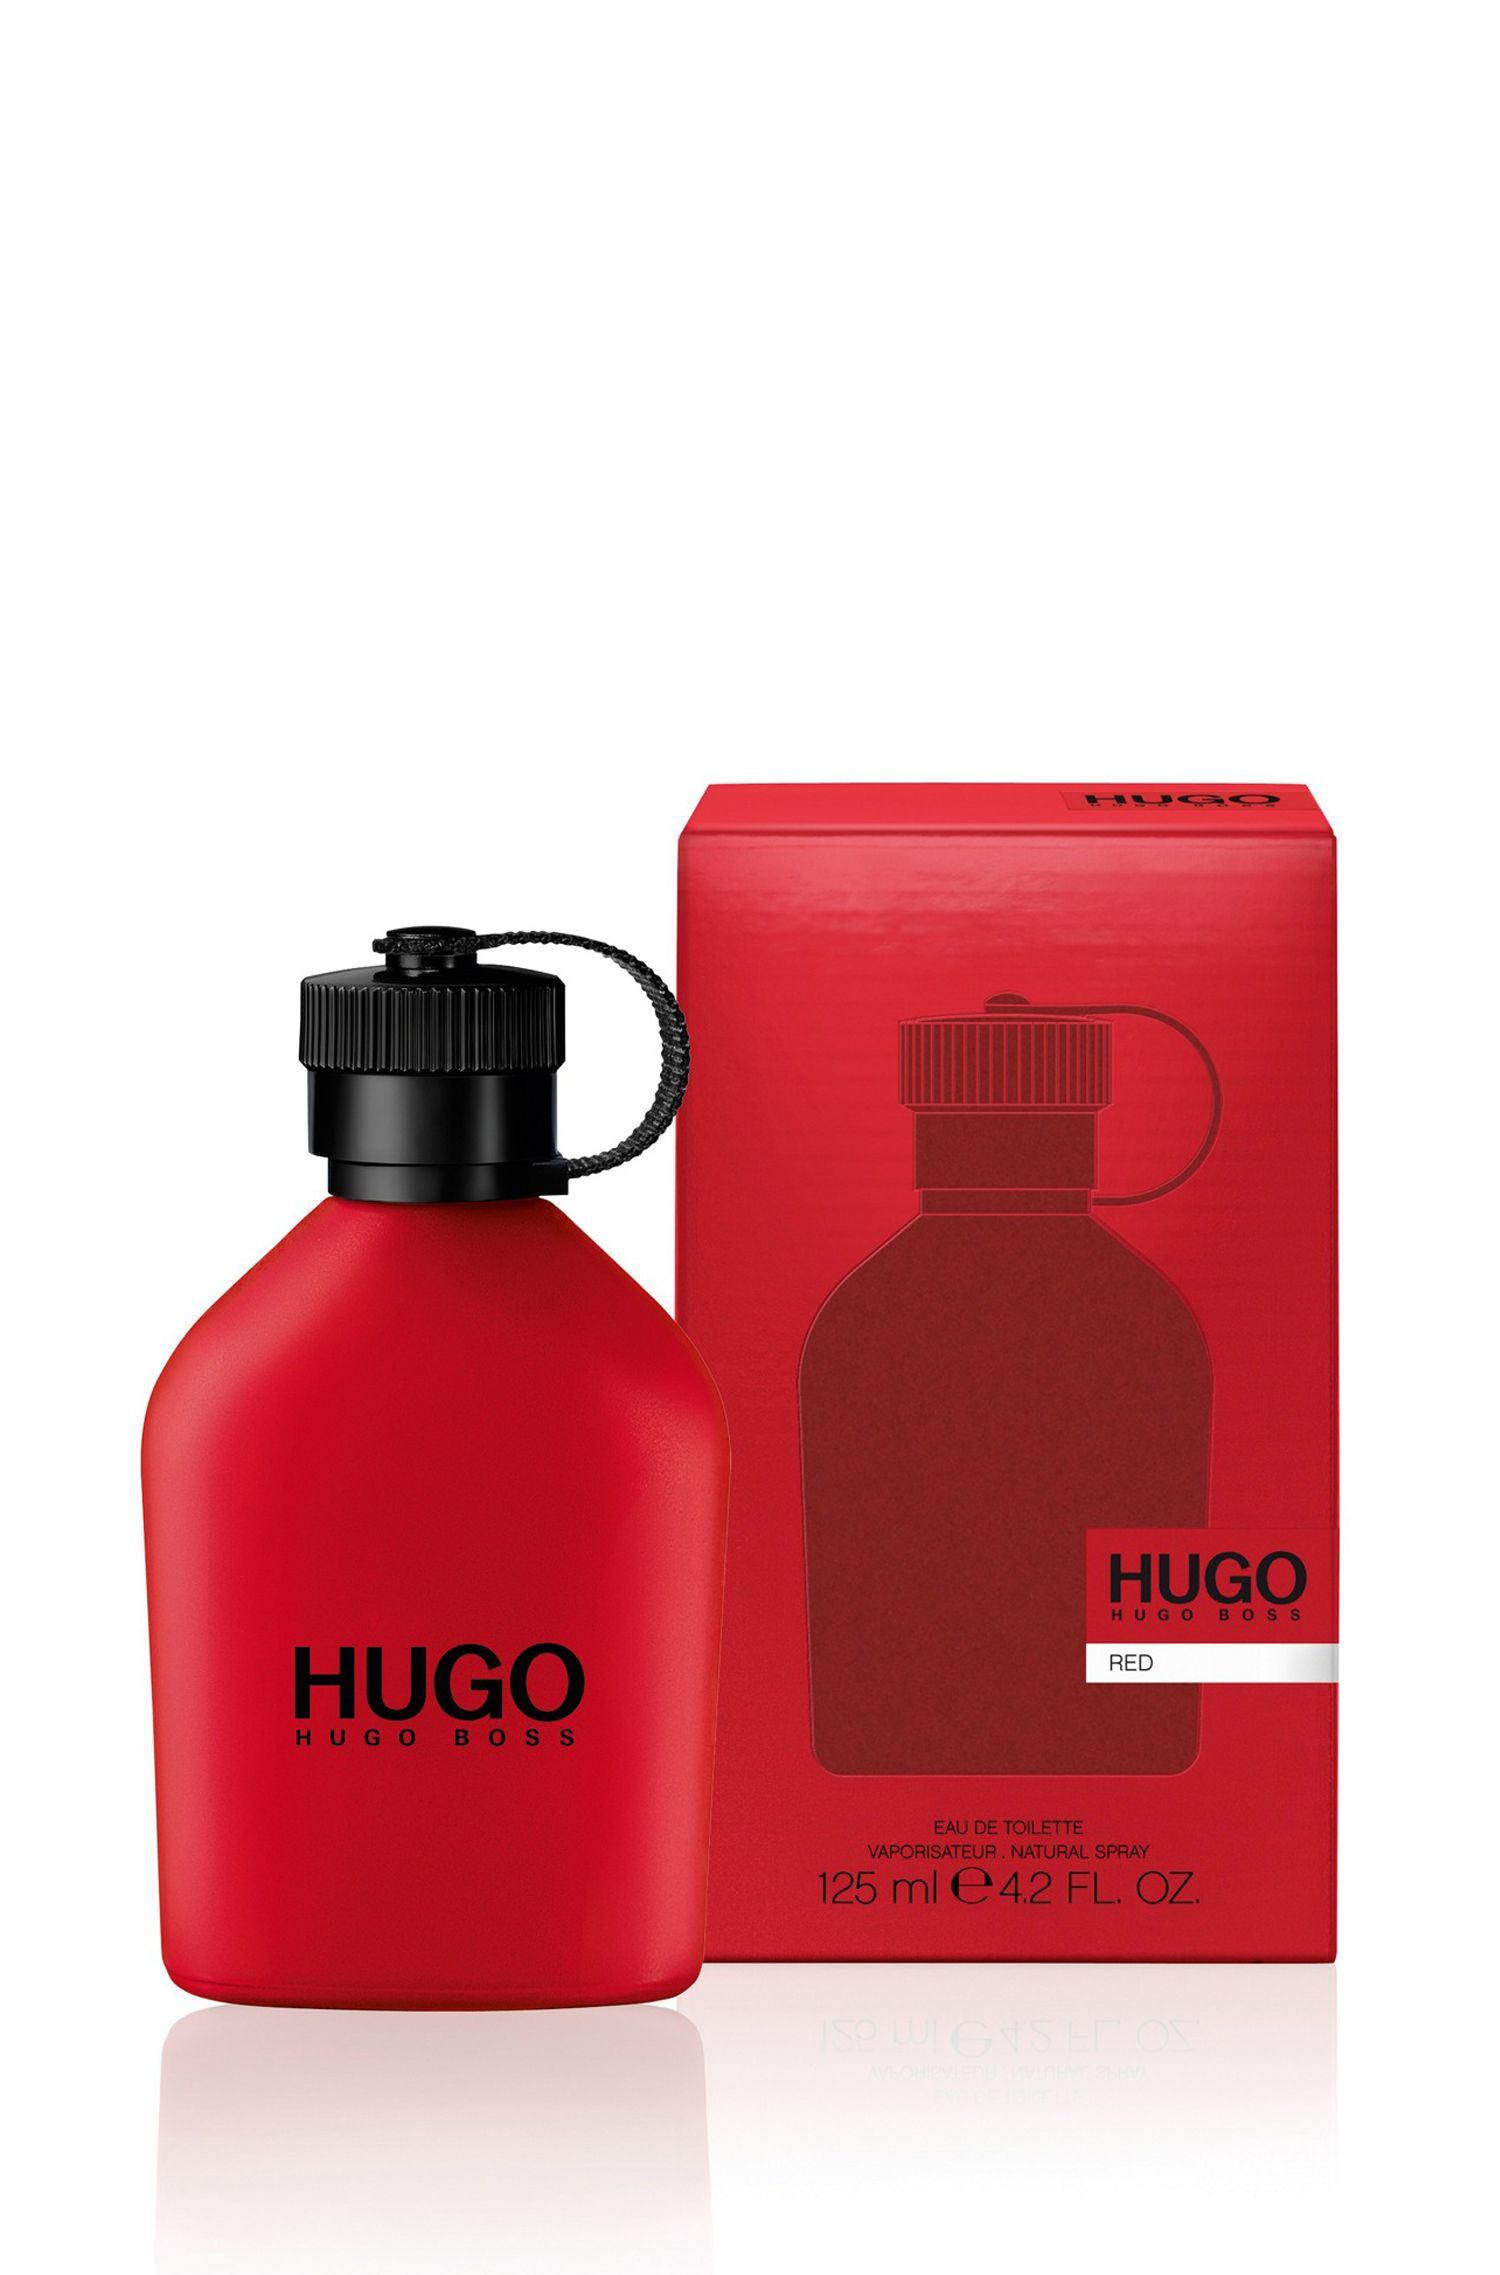 'HUGO Red' | 4.2 fl. oz. (125 mL) Eau de Toilette